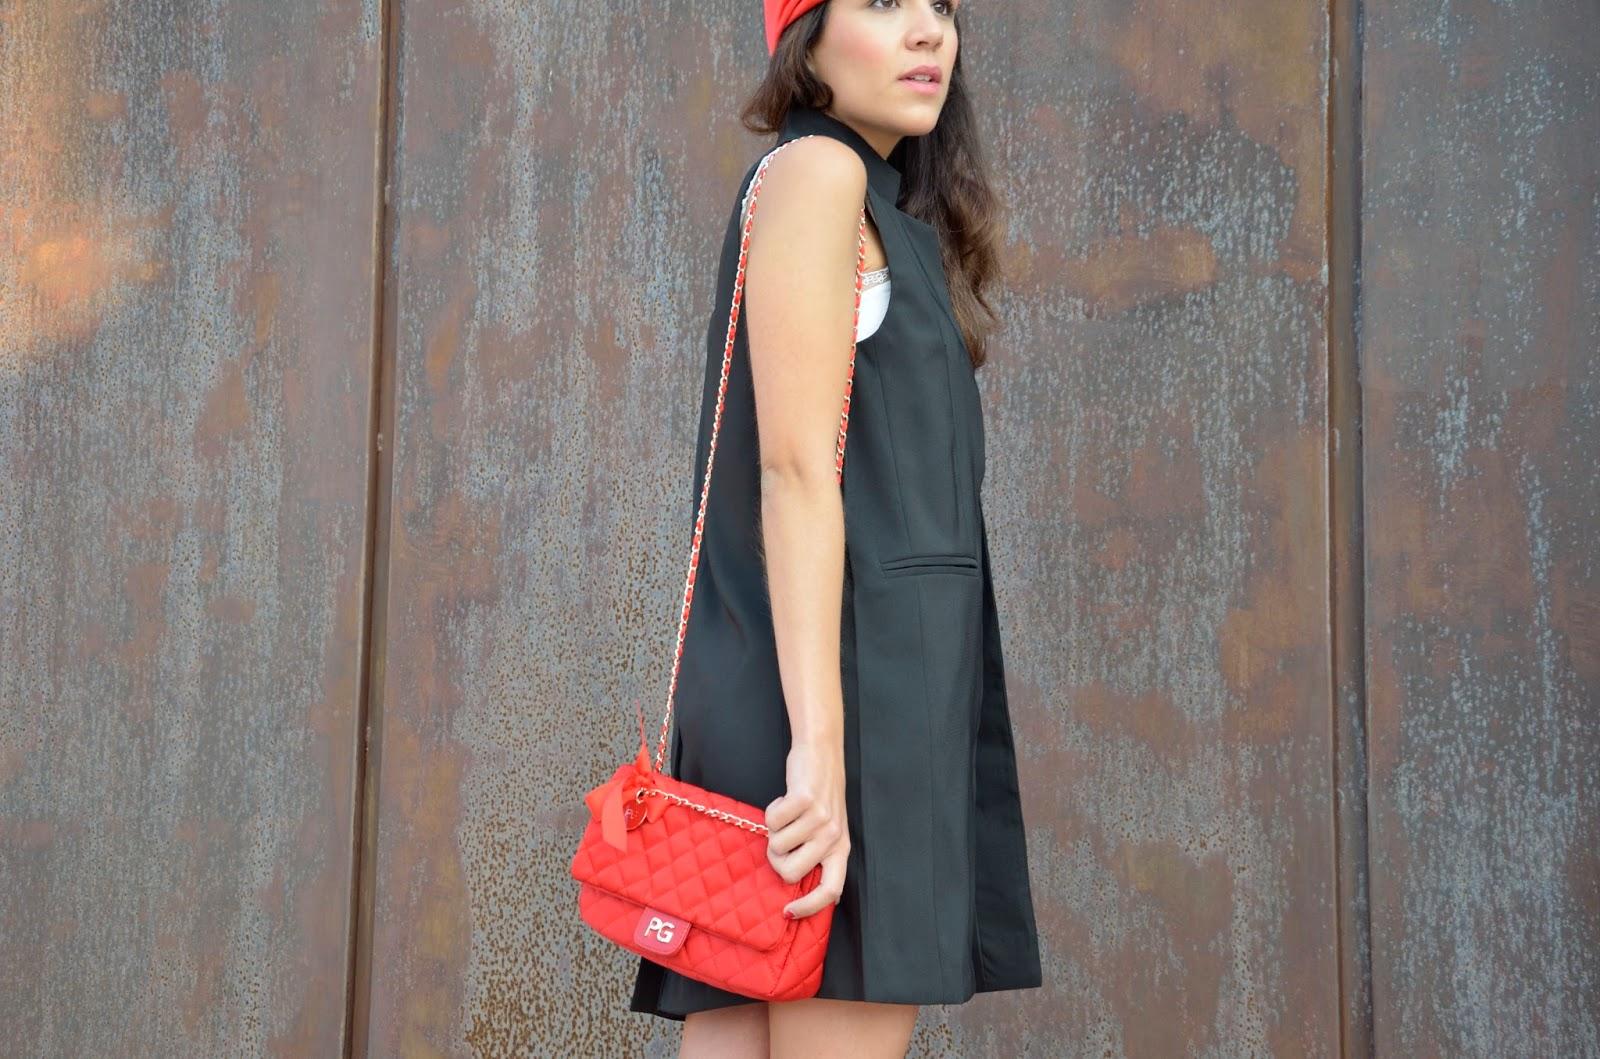 look-maxi-chaleco-turbante-outfit-rojo-negro-blanco- 5bc58d7872b